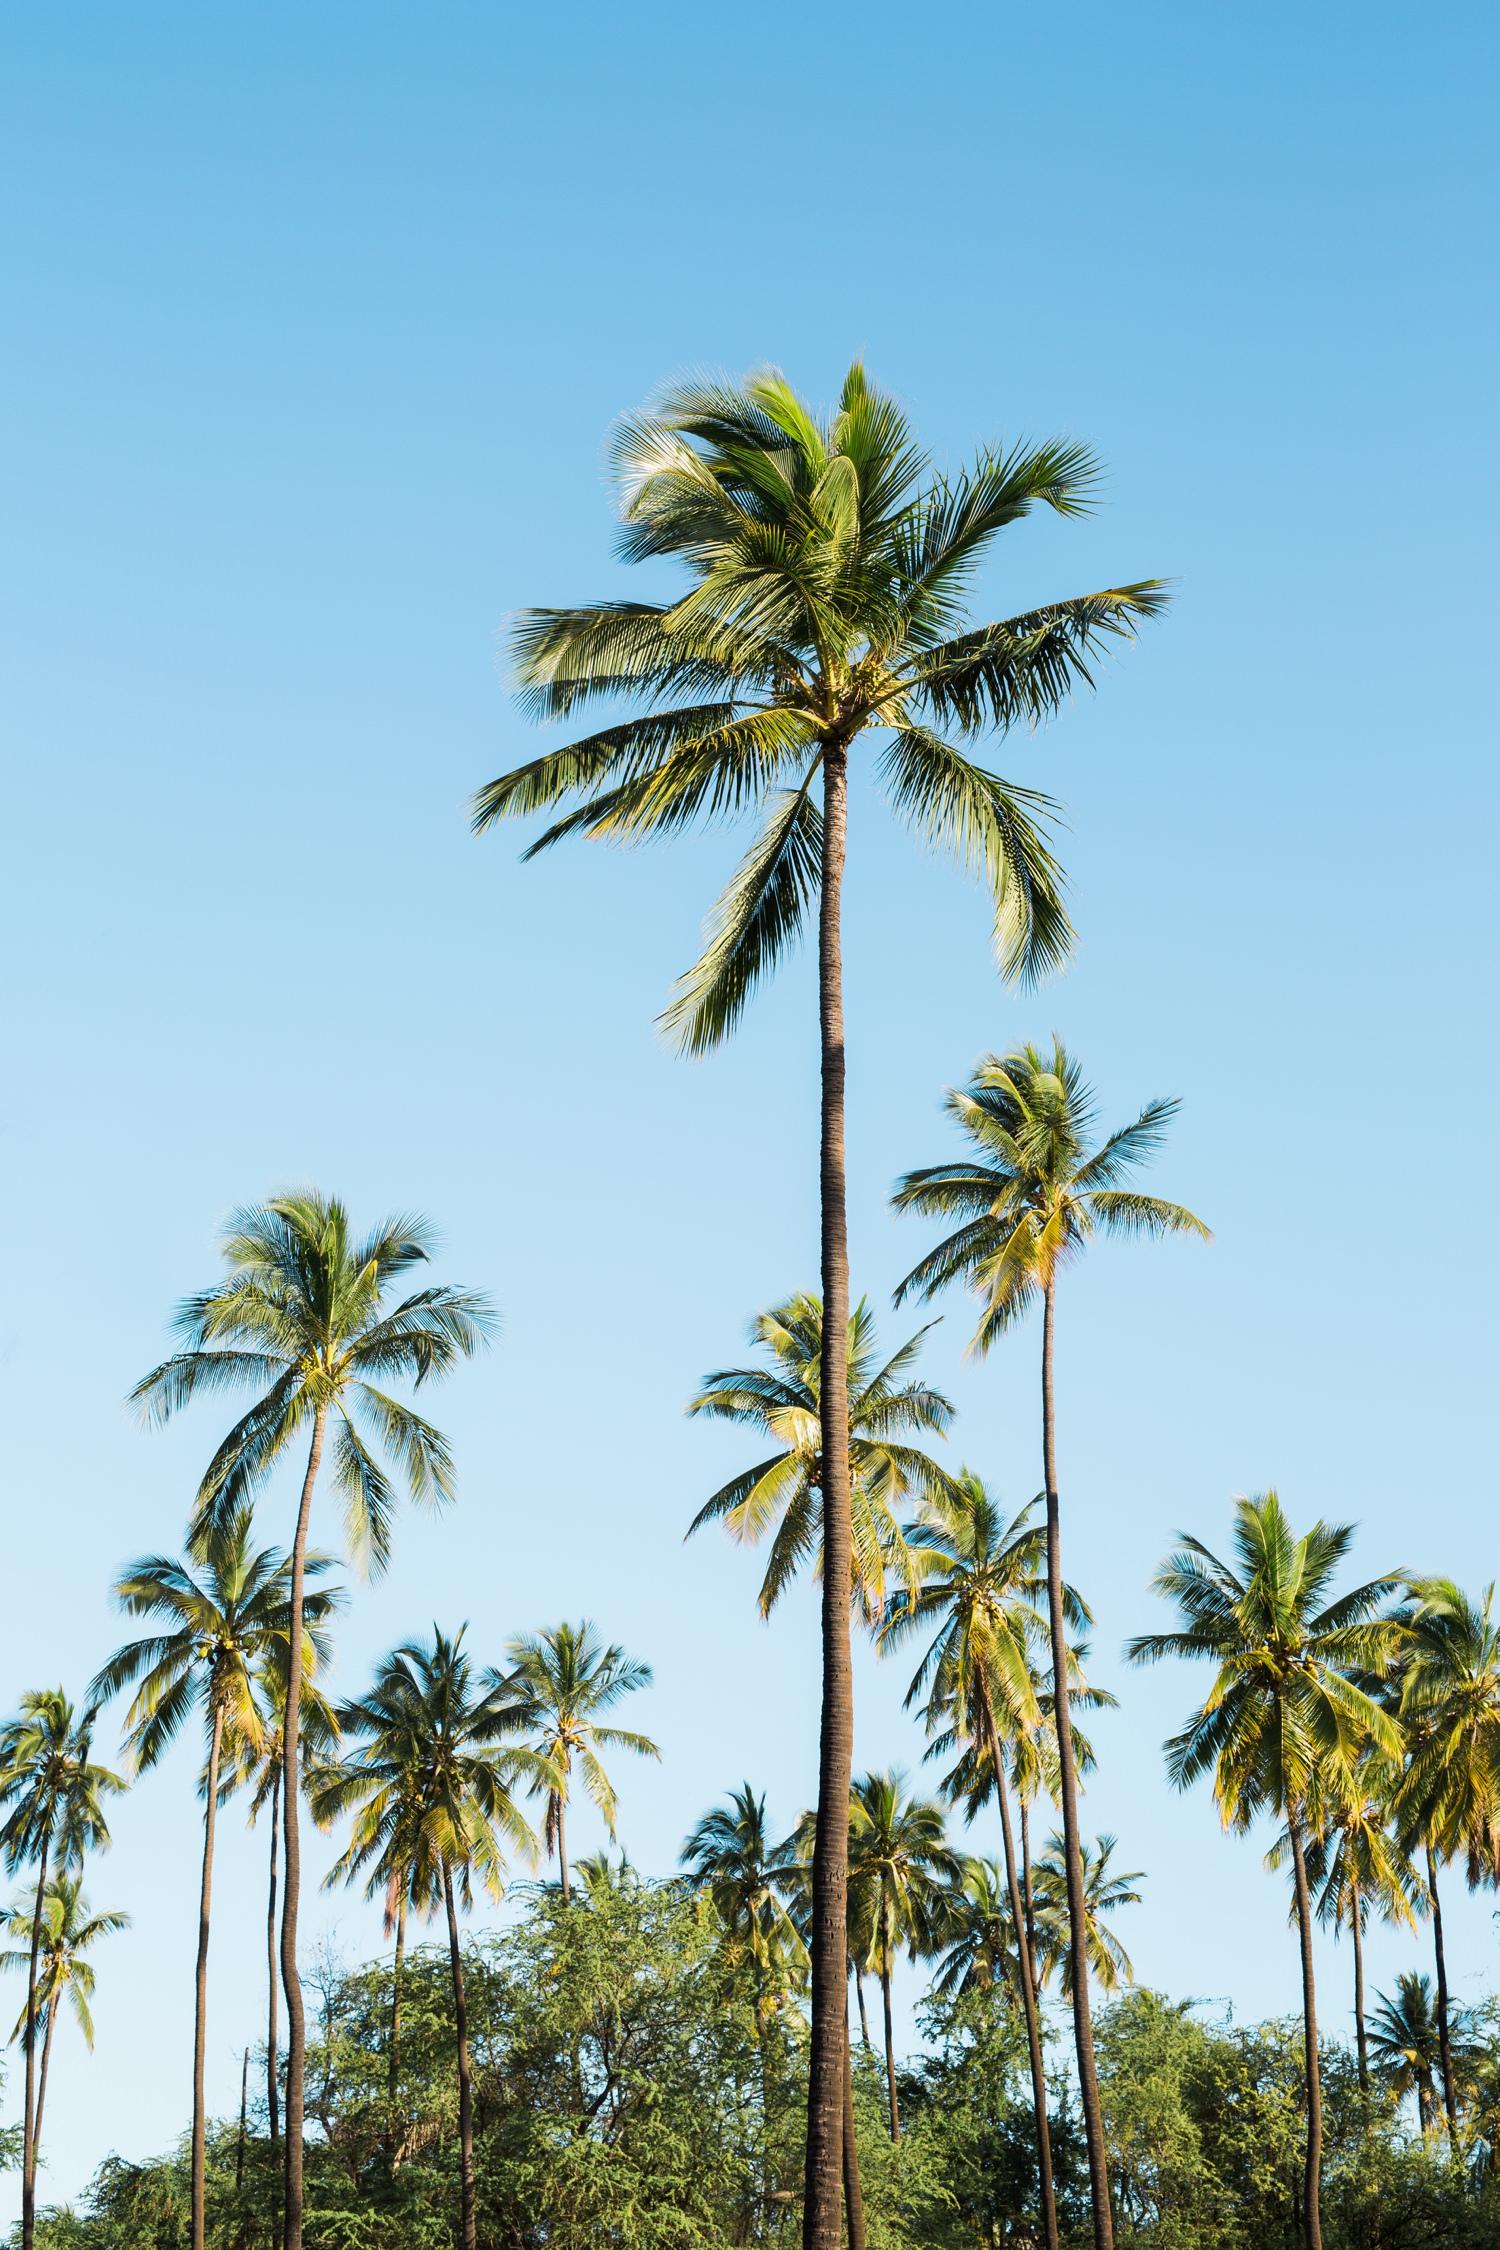 hawaii-travel-palm-trees-tropical-cameron-zegers.jpg